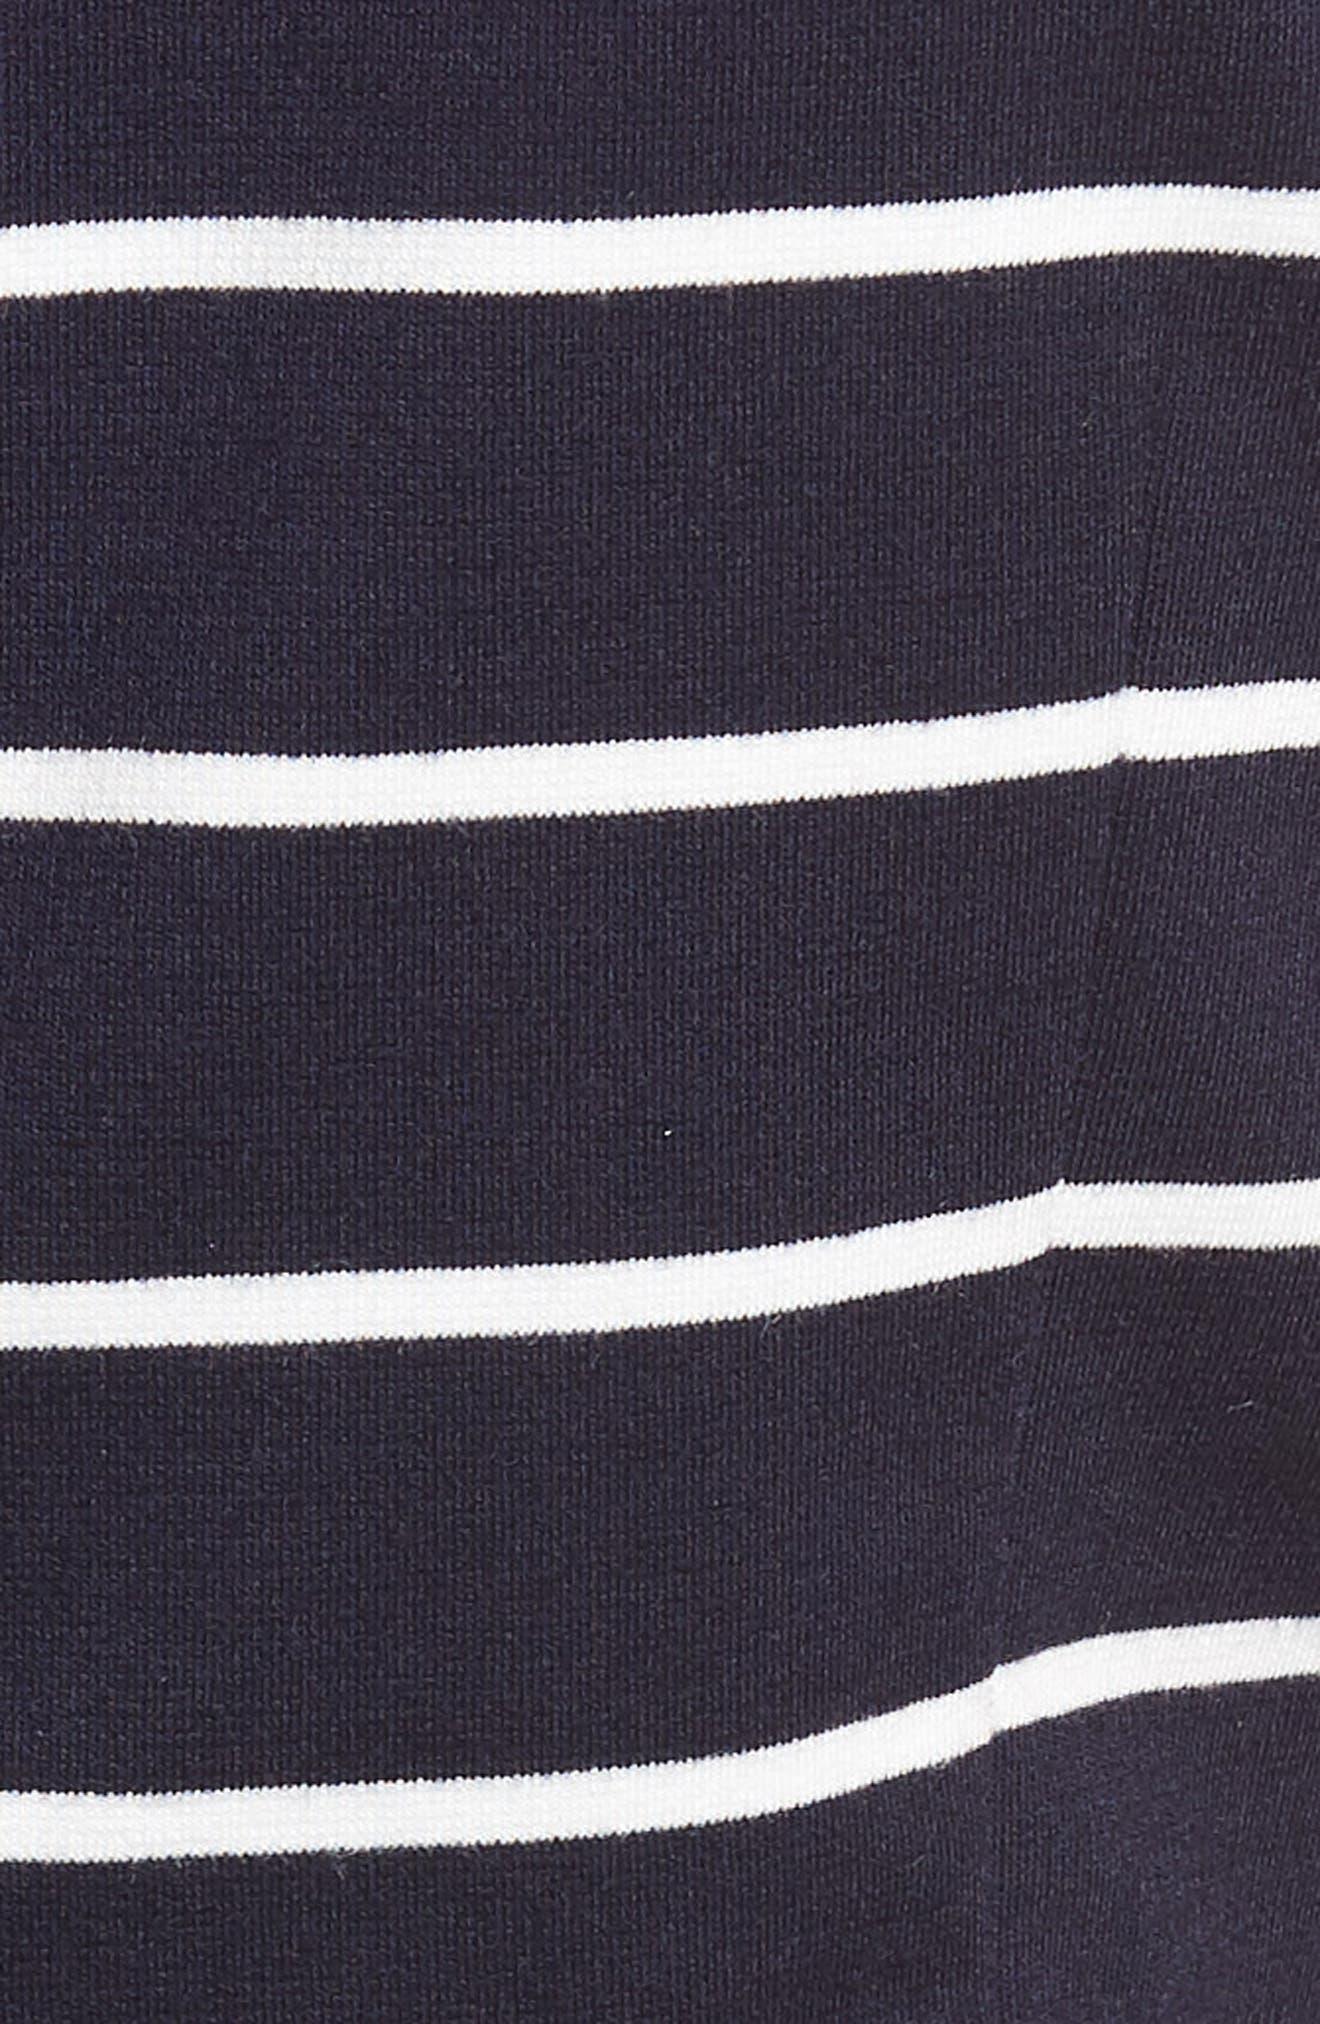 Stripe Ponte Fit & Flare Dress,                             Alternate thumbnail 6, color,                             Navy- White Stripe